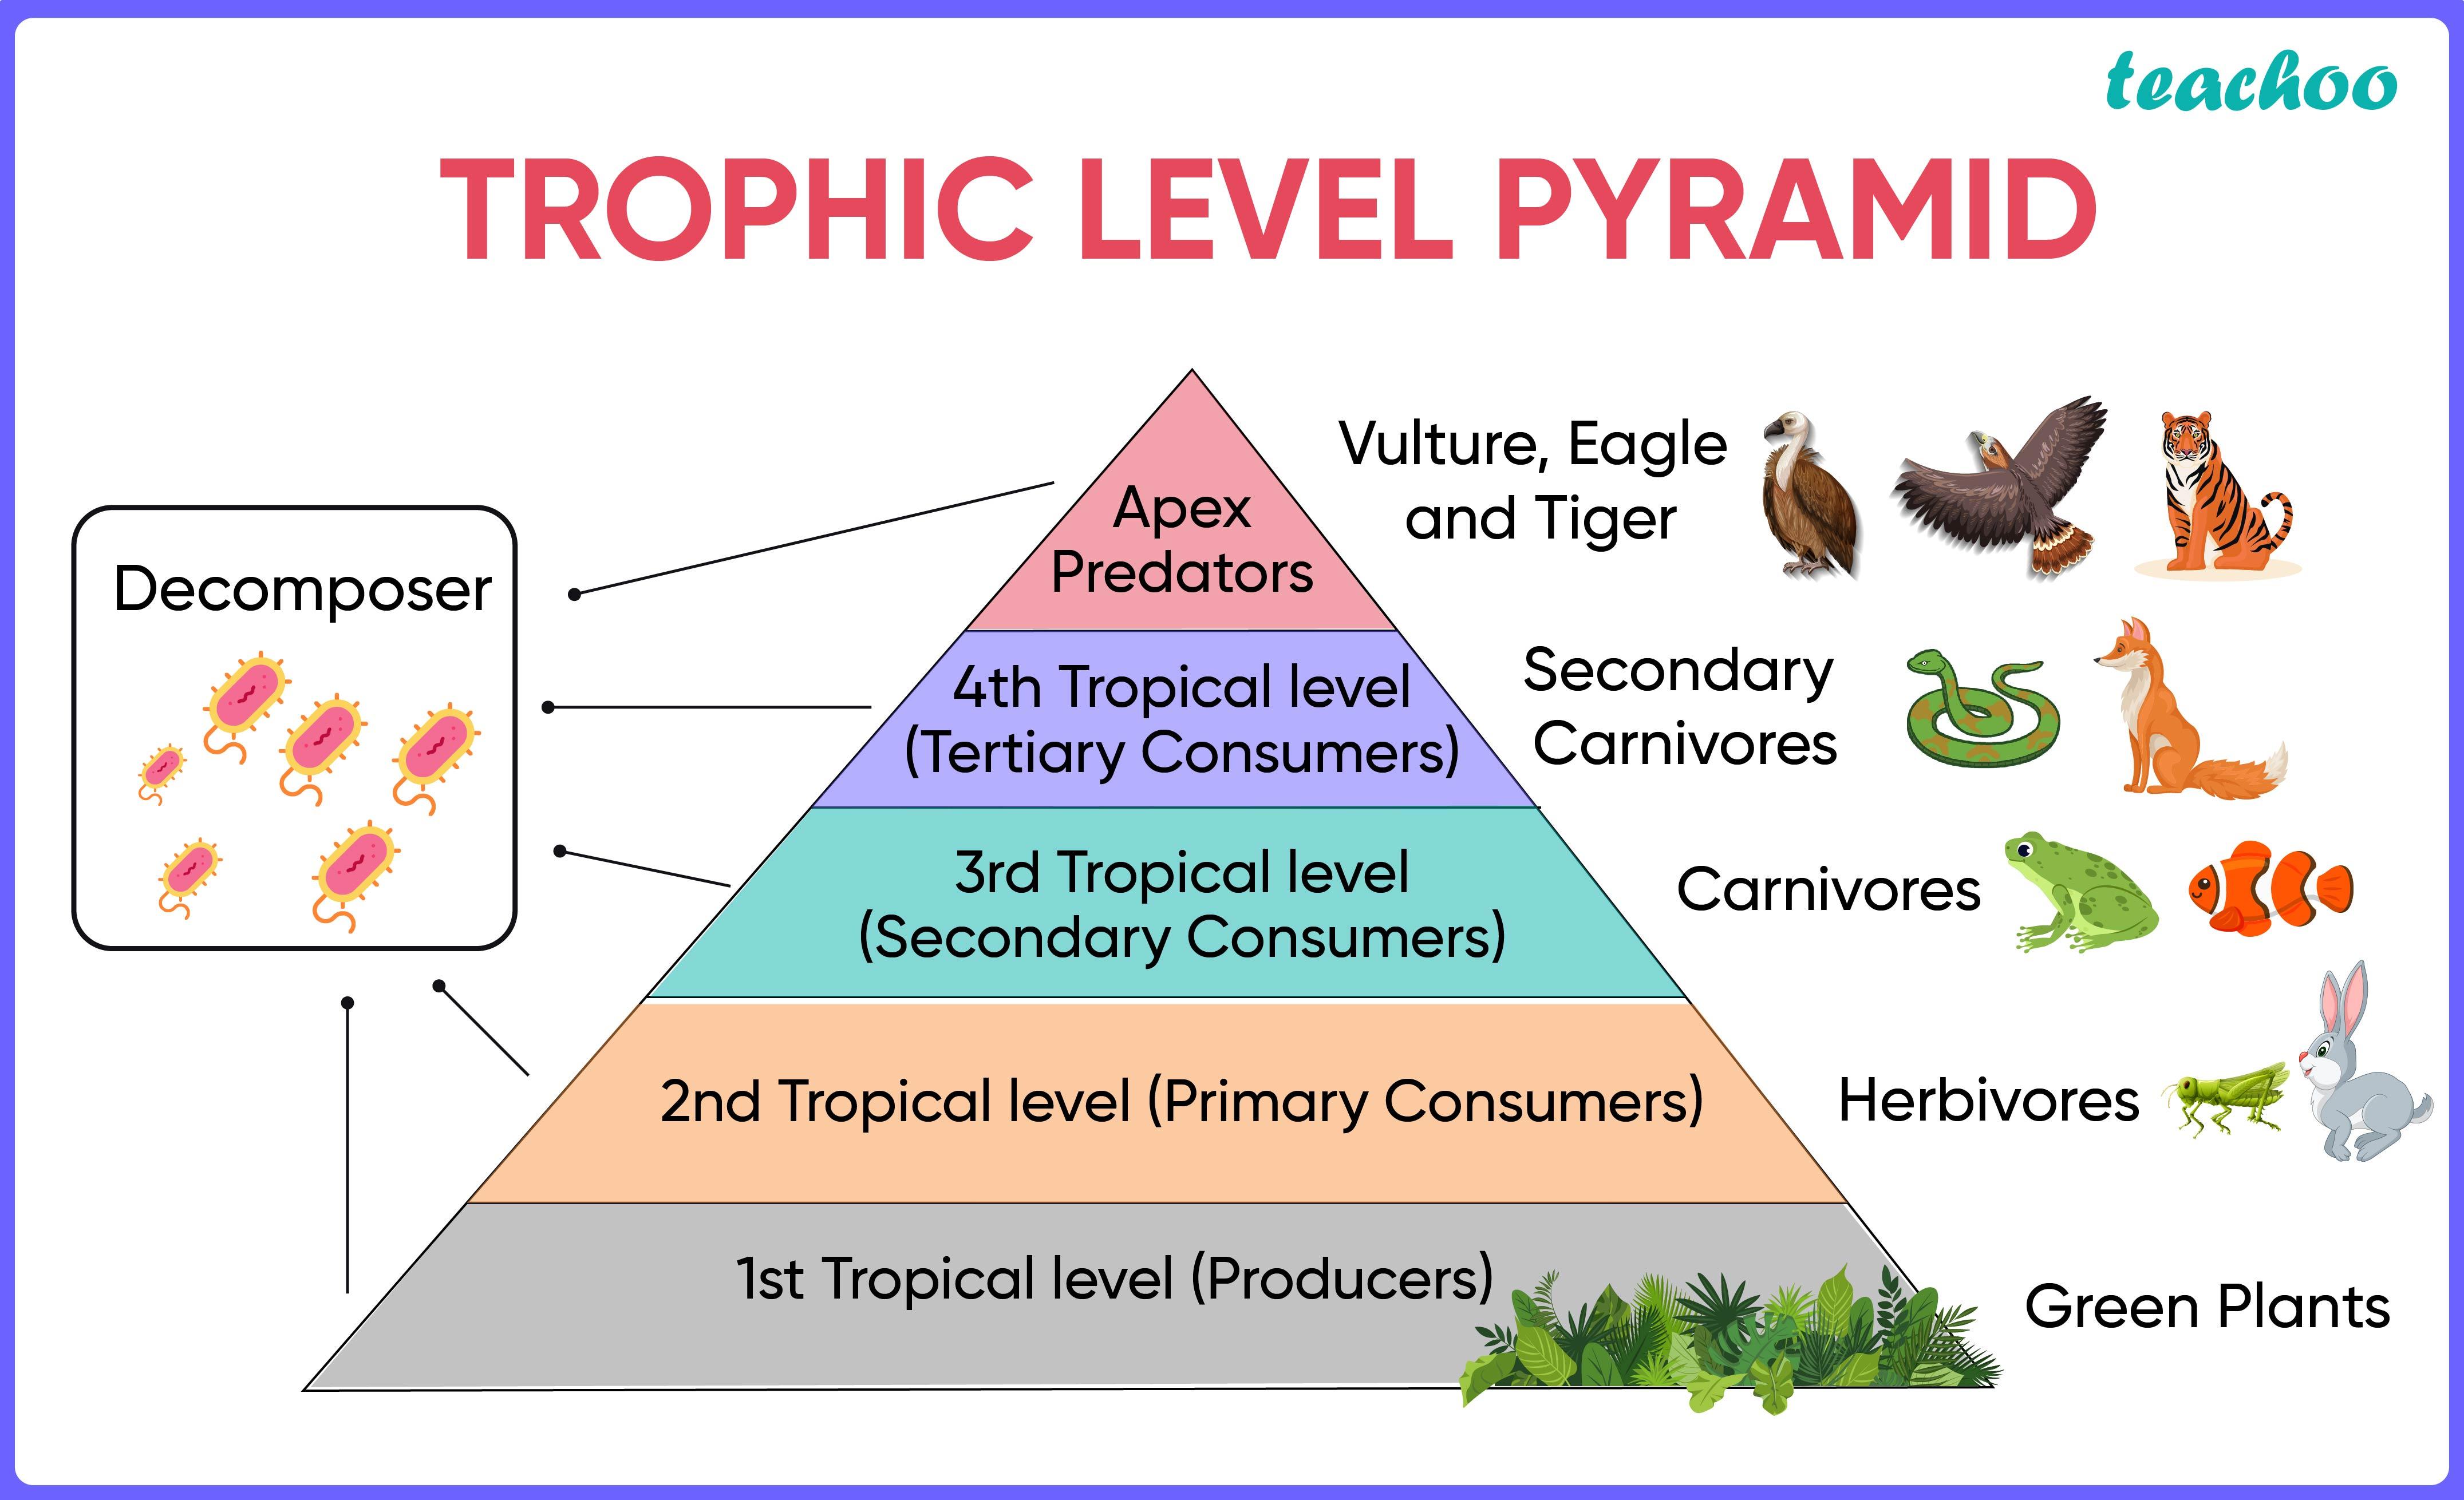 Trophic Level Pyramid-Teachoo-01.jpg